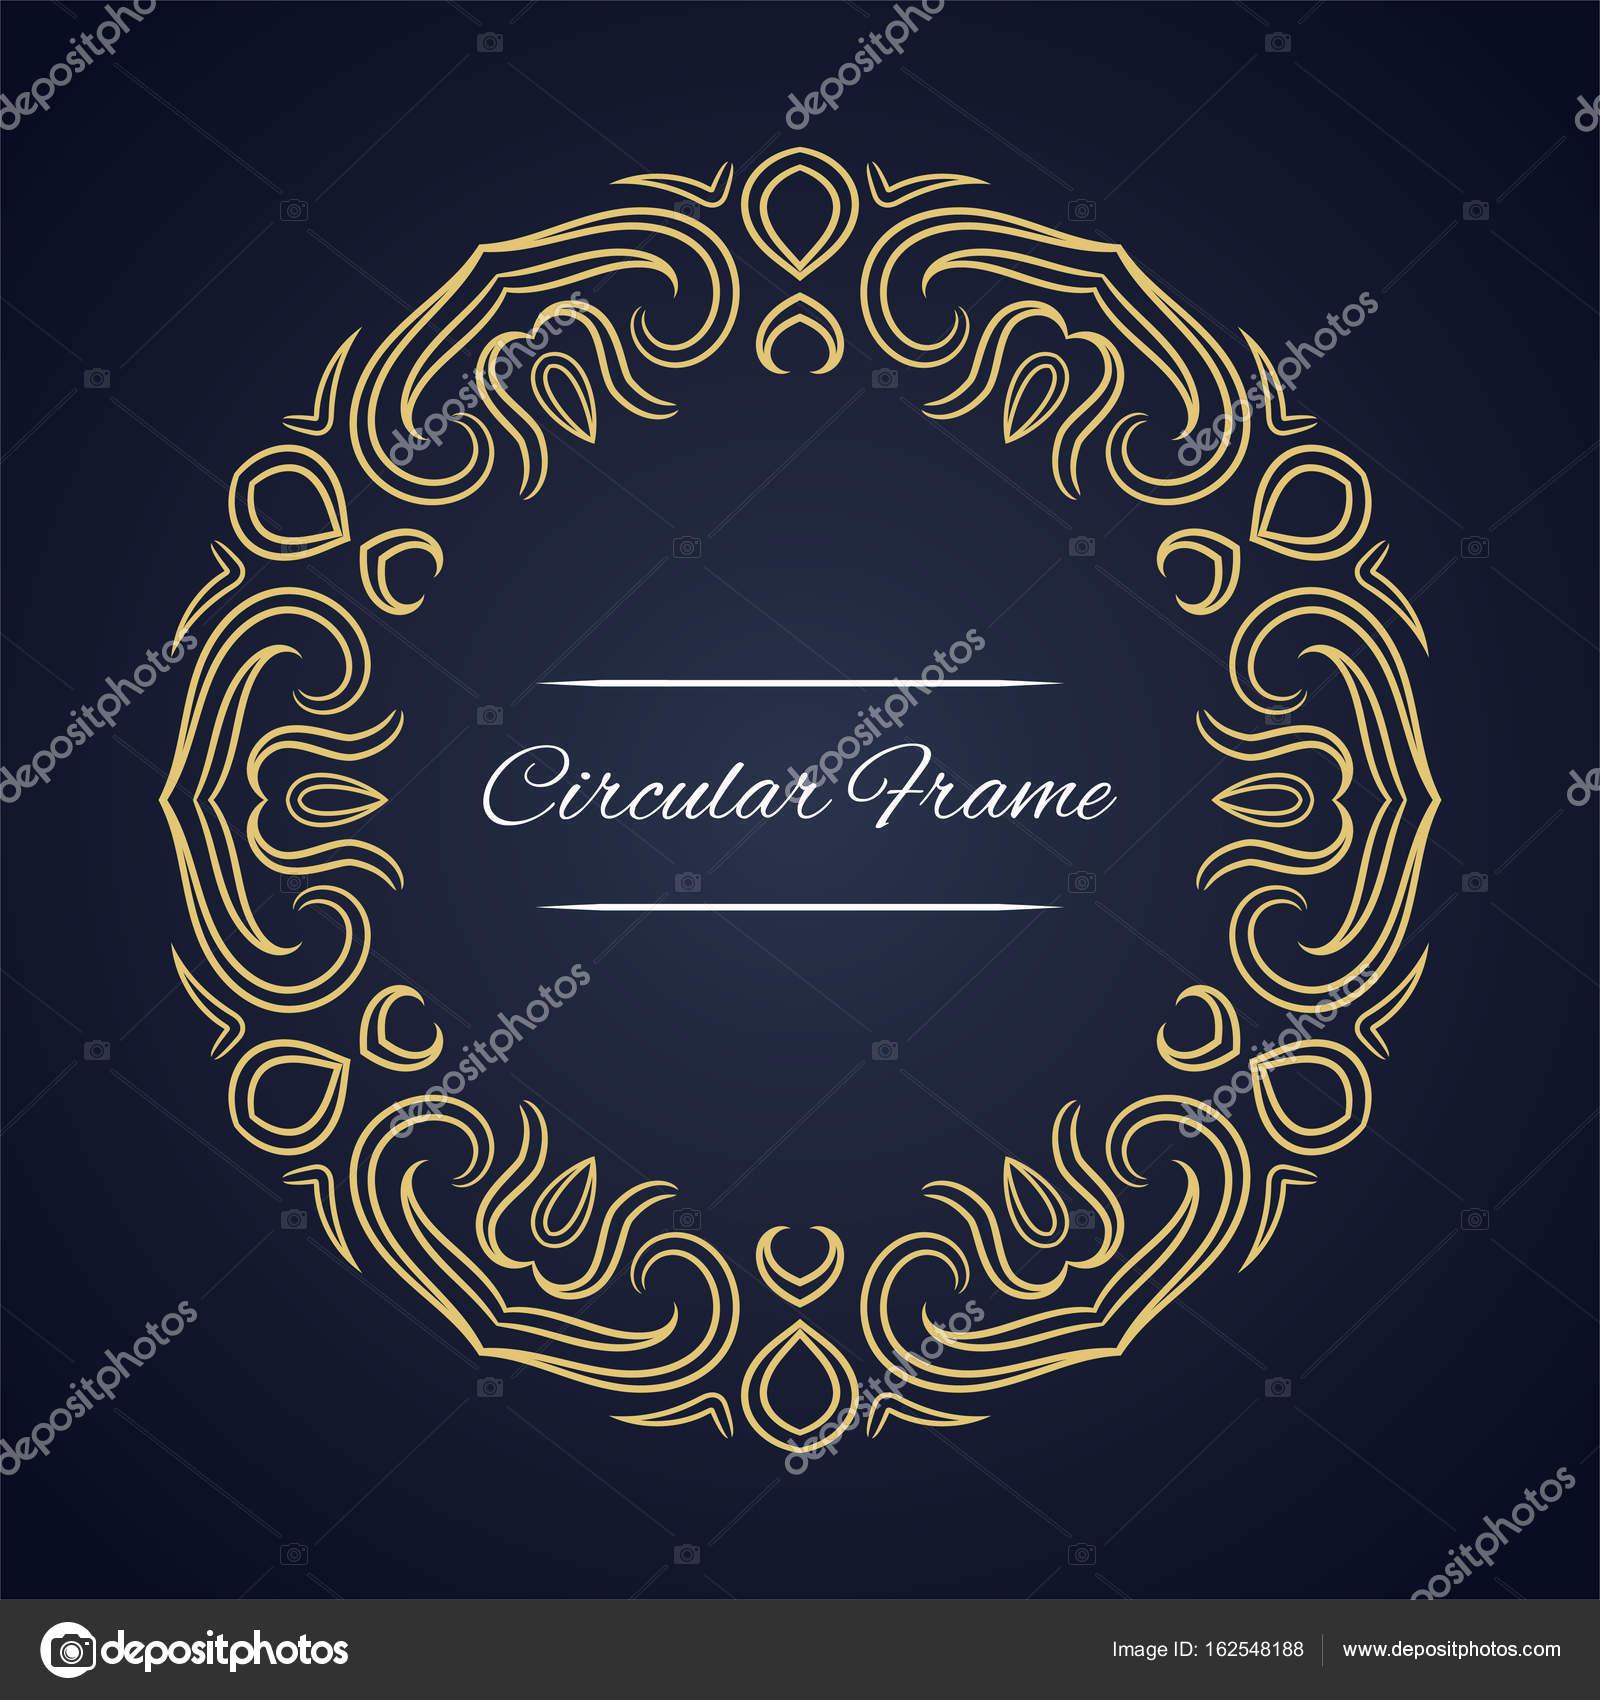 Zirkuläre Vektor Rahmen. Kartenvorlage mit ornament — Stockvektor ...